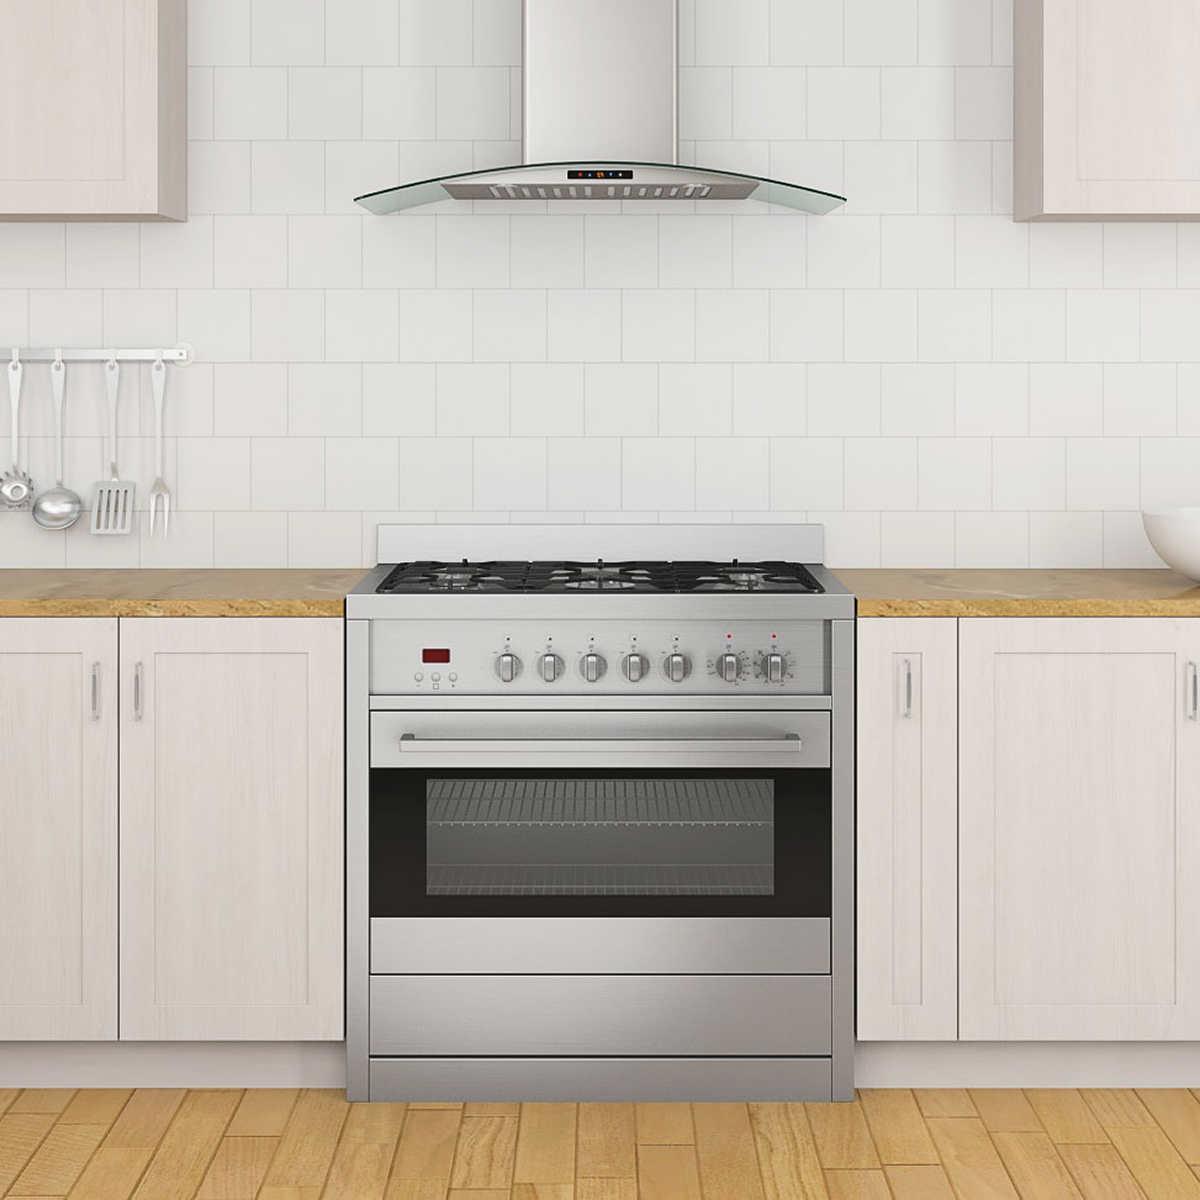 40 kitchen vent range hood design ideas36 kitchen range hood. 216